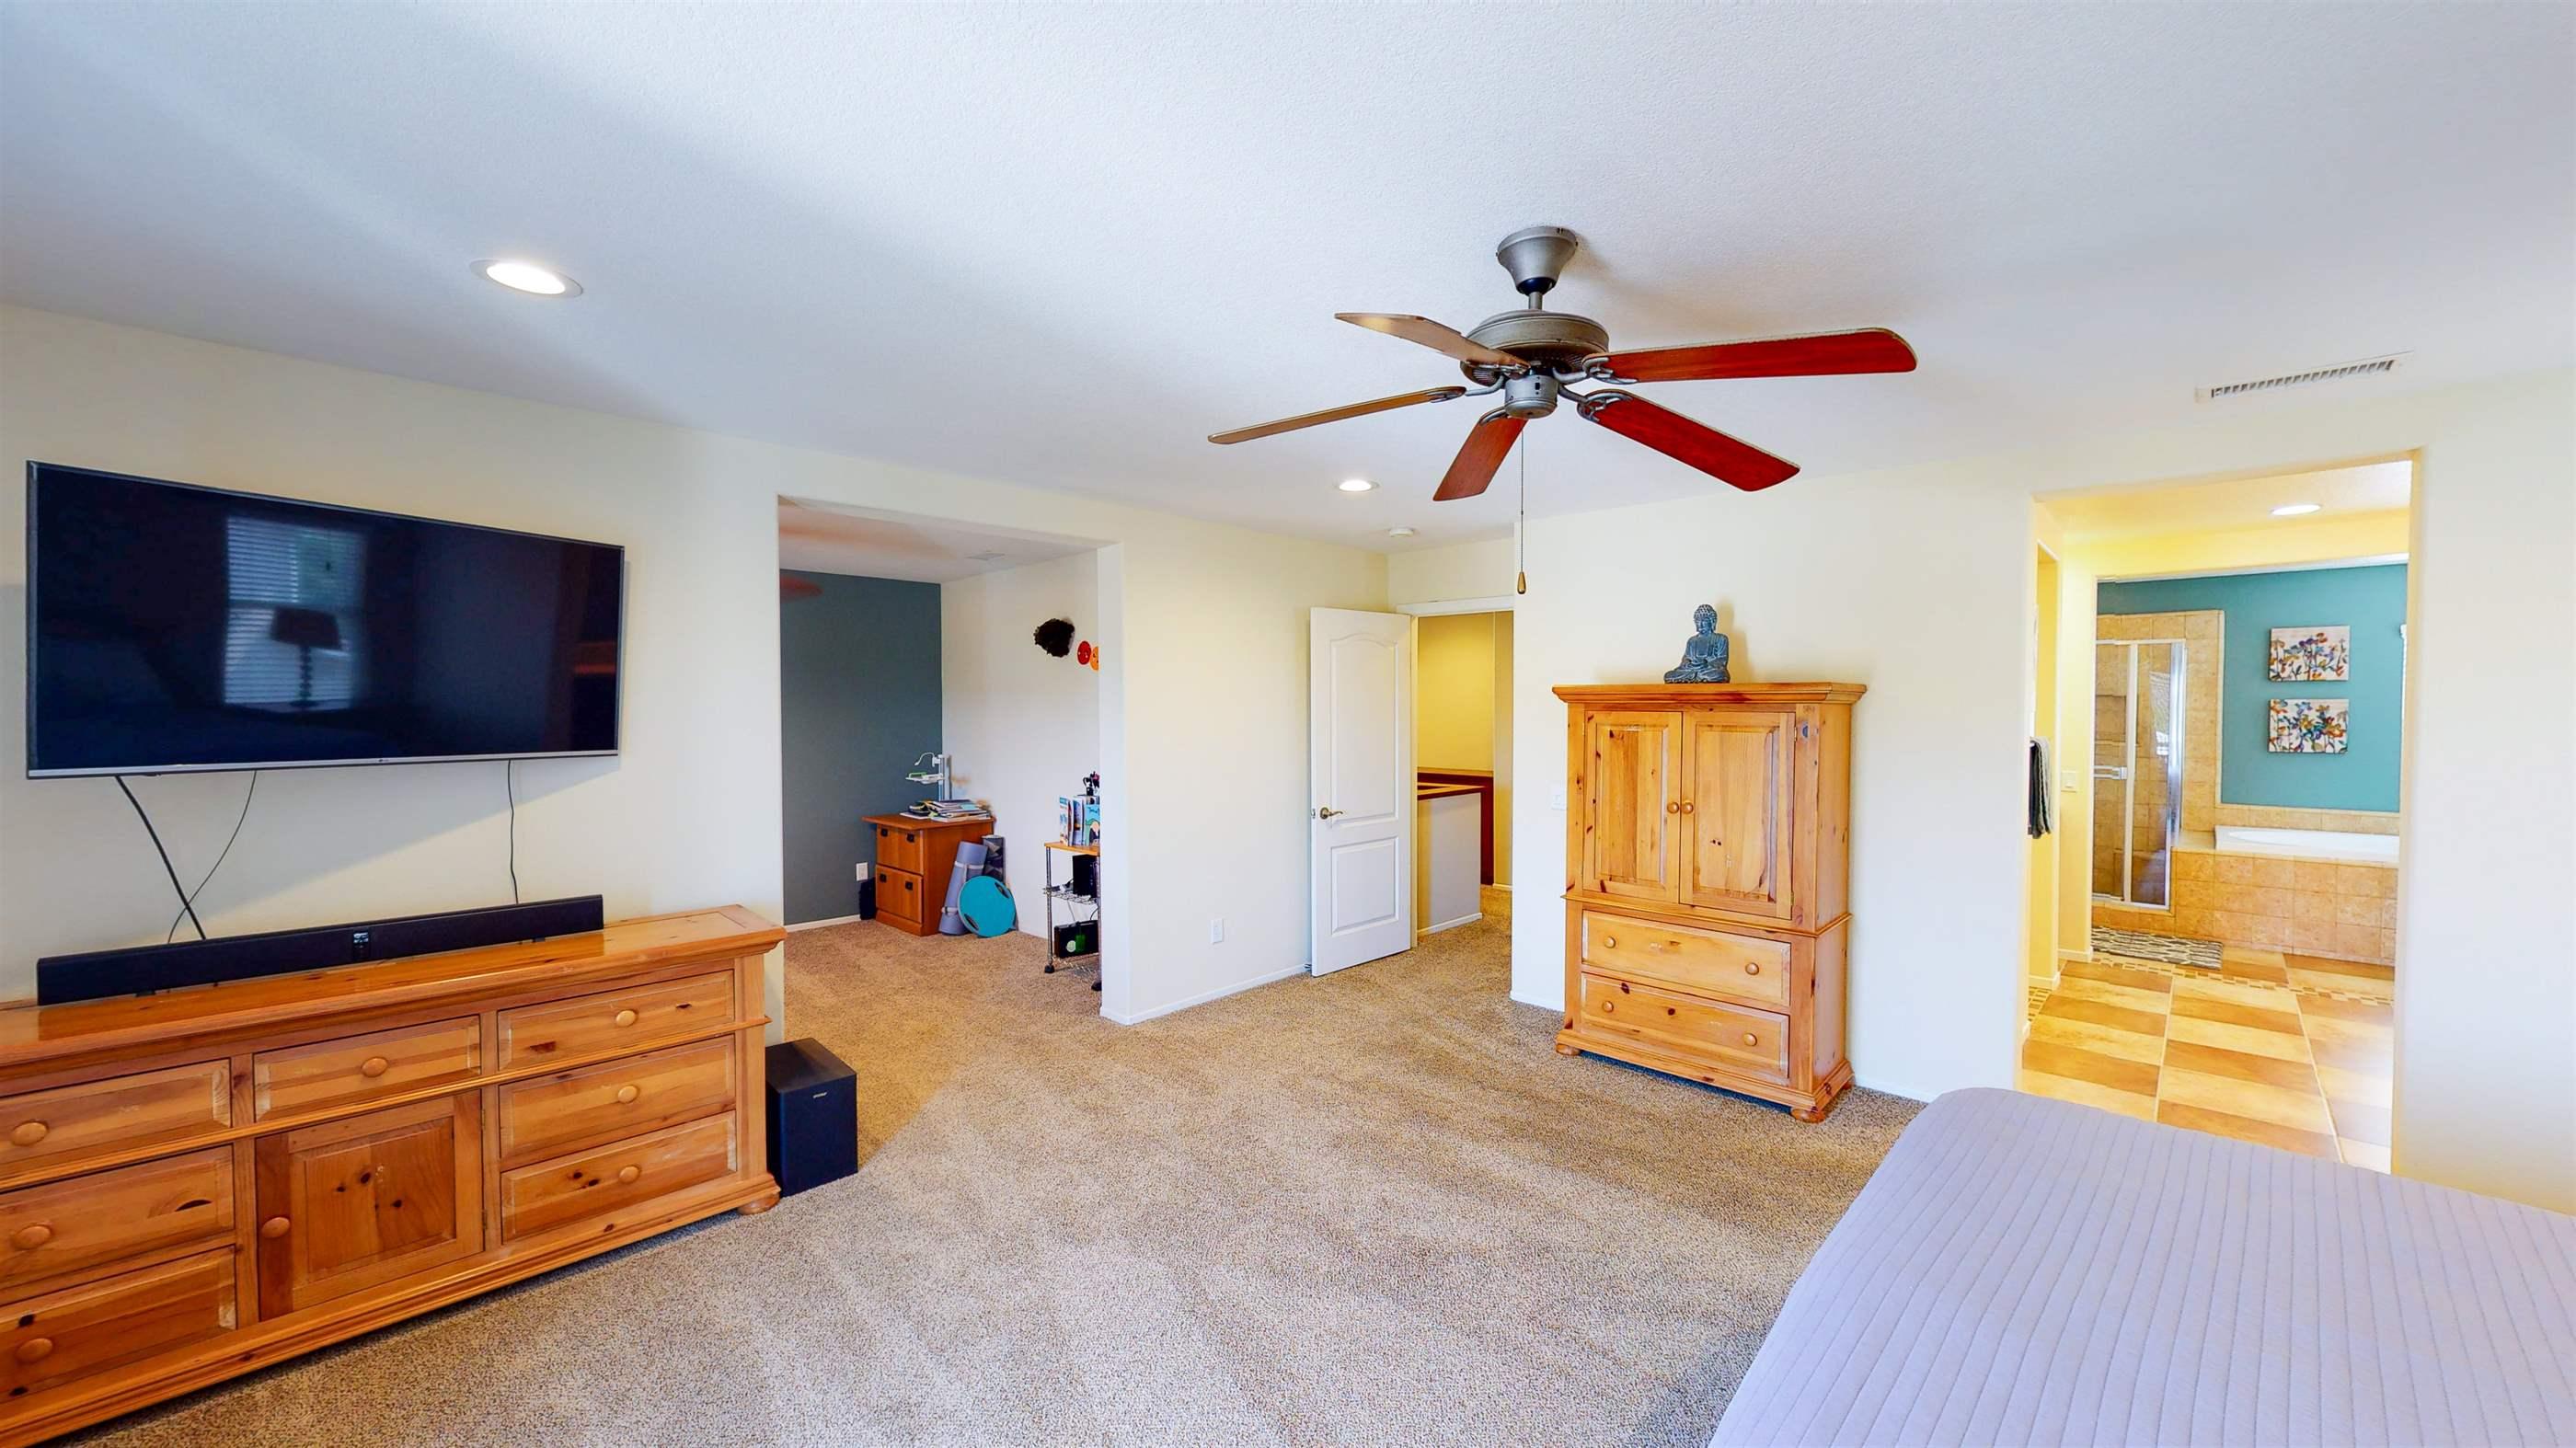 35817 Darcy Place, Murrieta, CA 92562